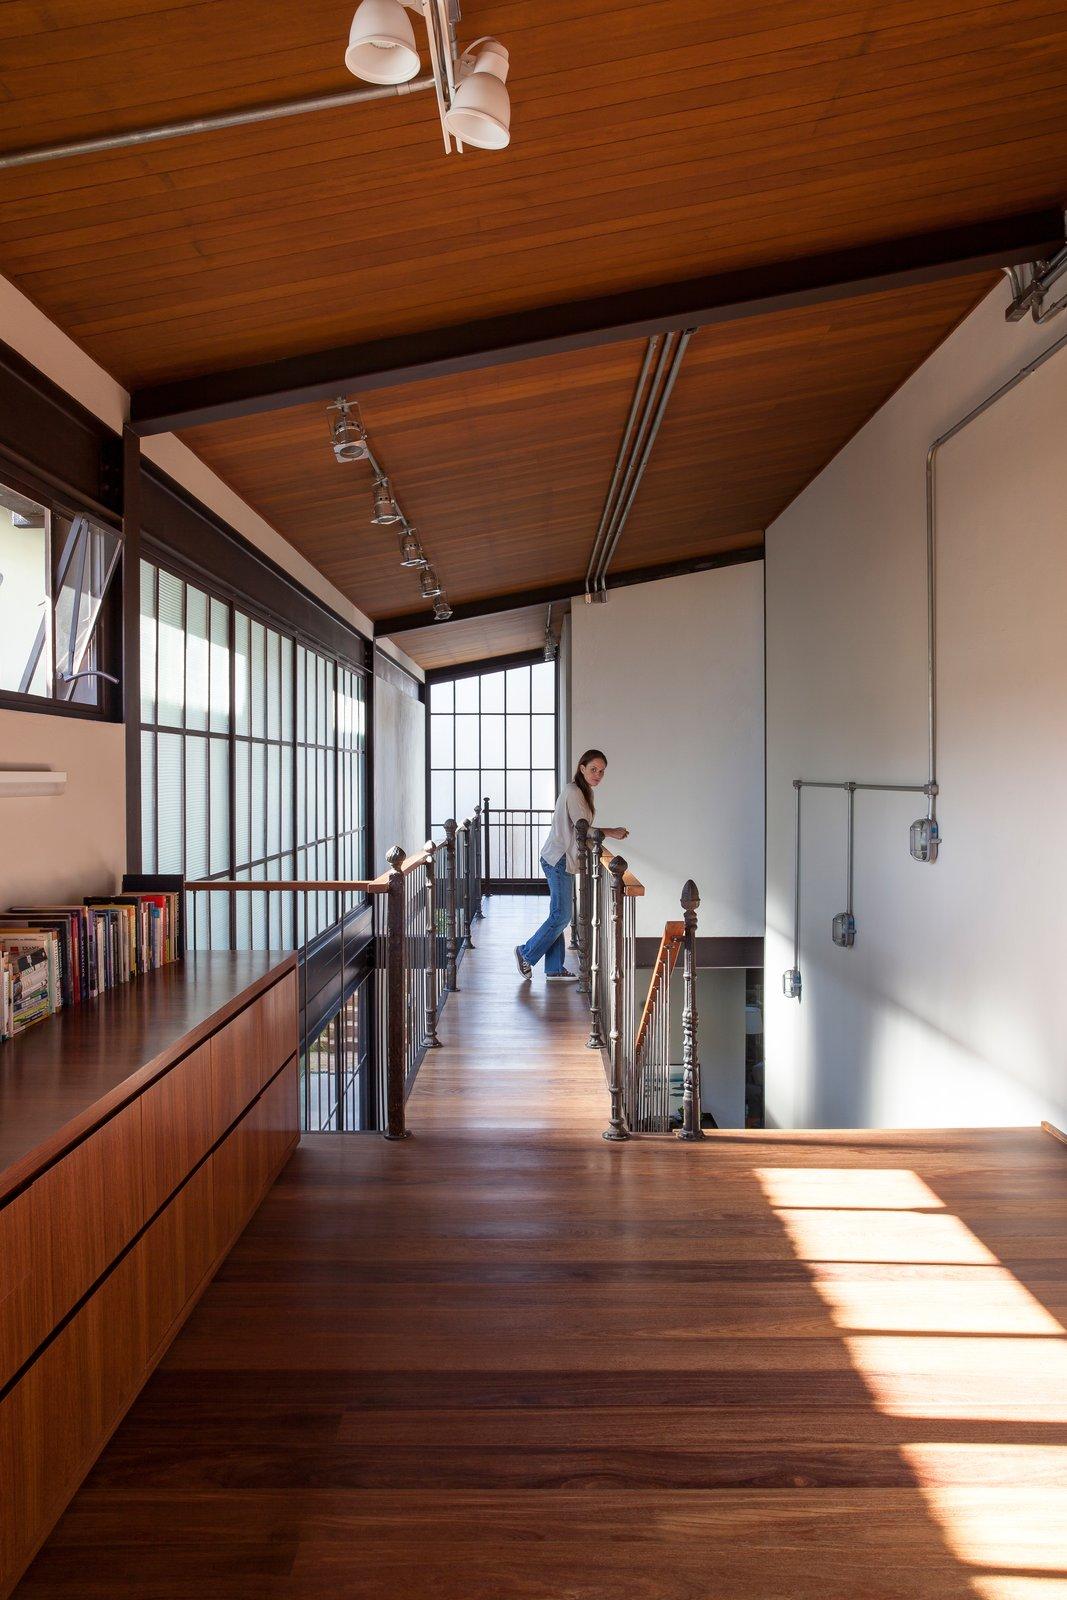 Hallway and Medium Hardwood Floor  Conde D'eu House